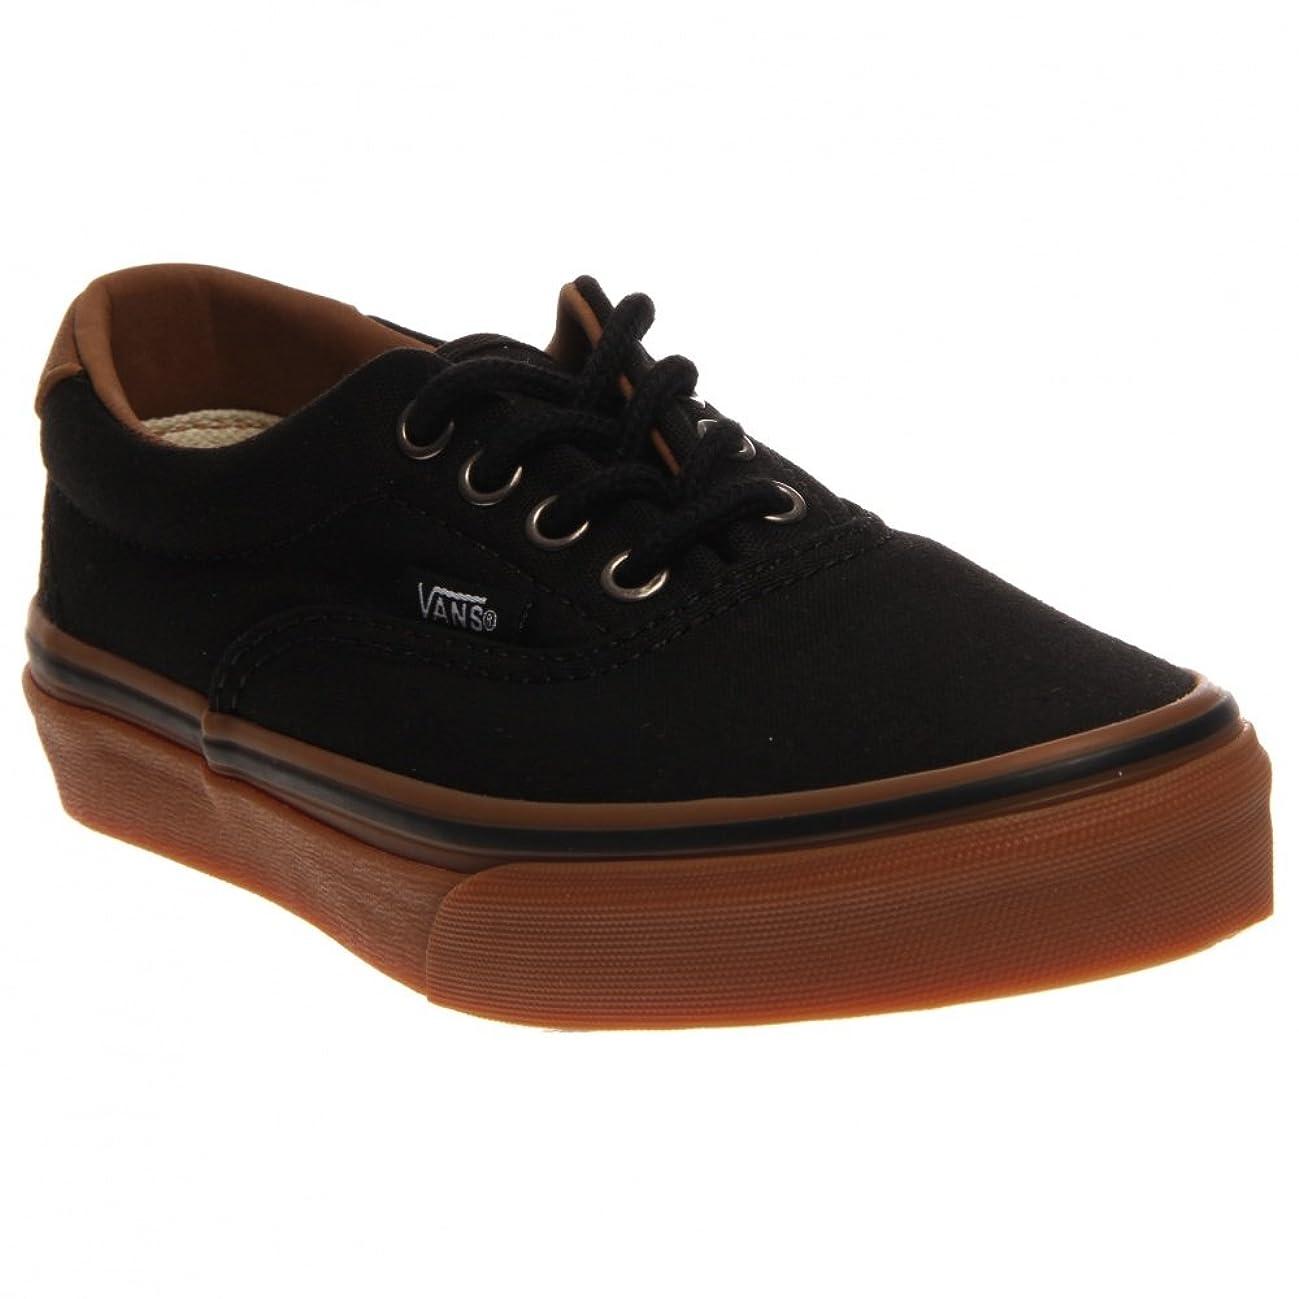 Vans Era 59 Athletic Boy's Shoe